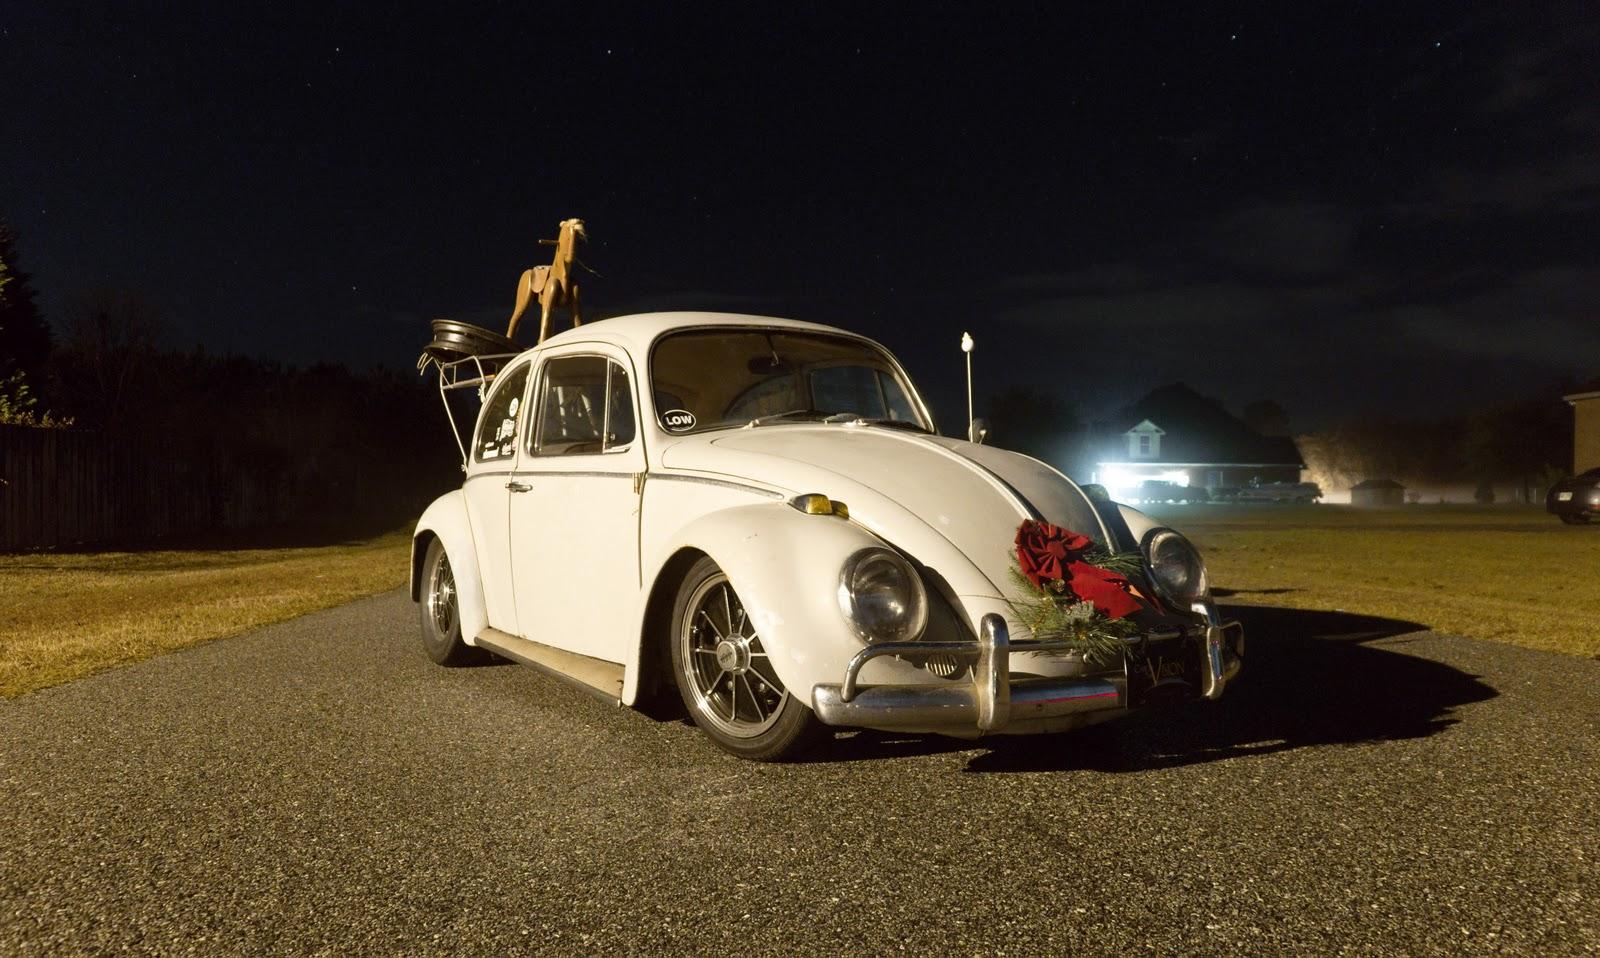 Otis - my '65 Beetle DSC_0005-3